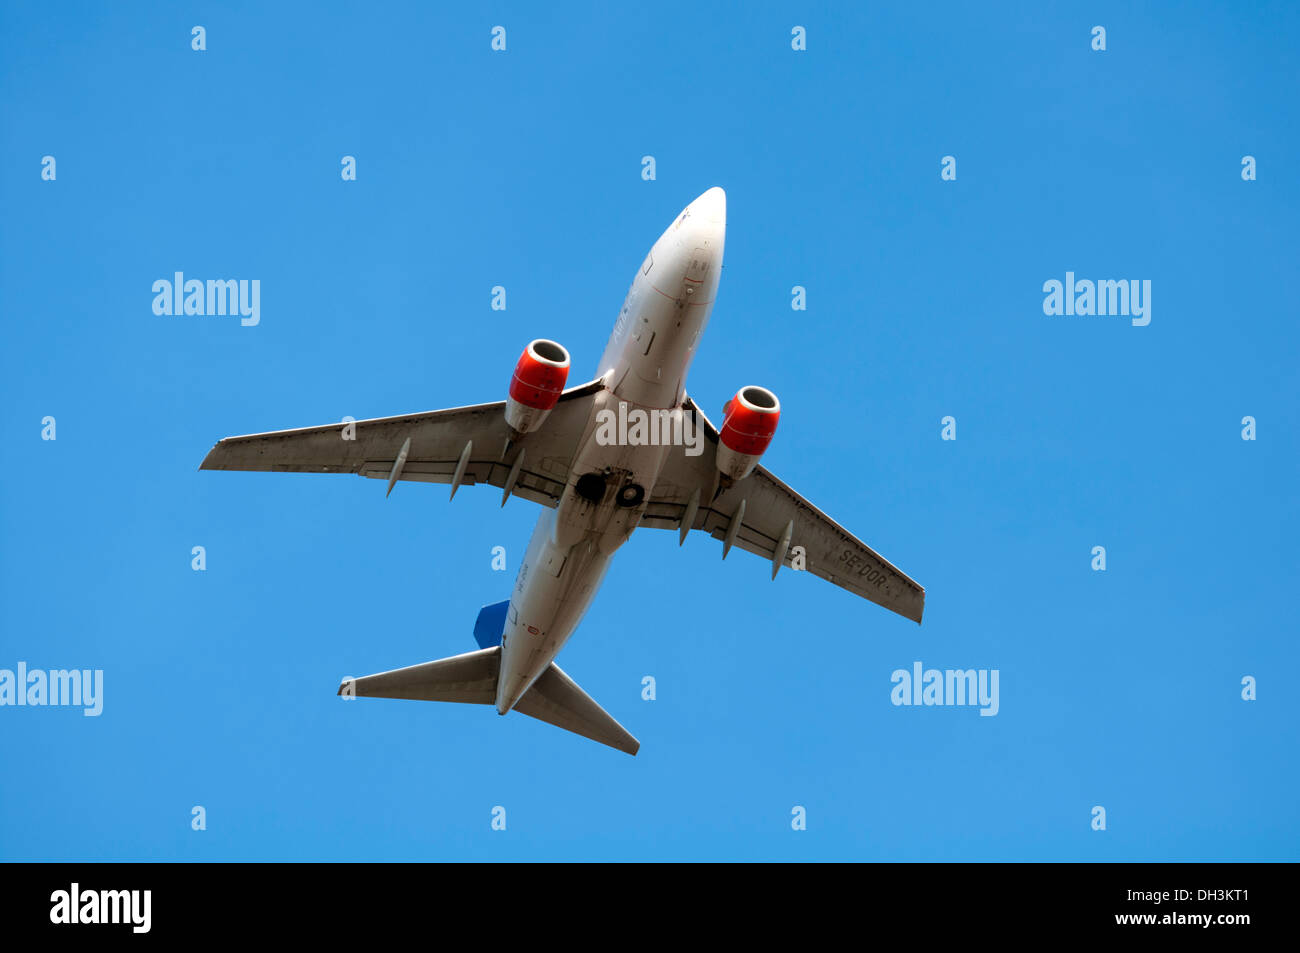 SAS Boeing 737 aircraft - Stock Image